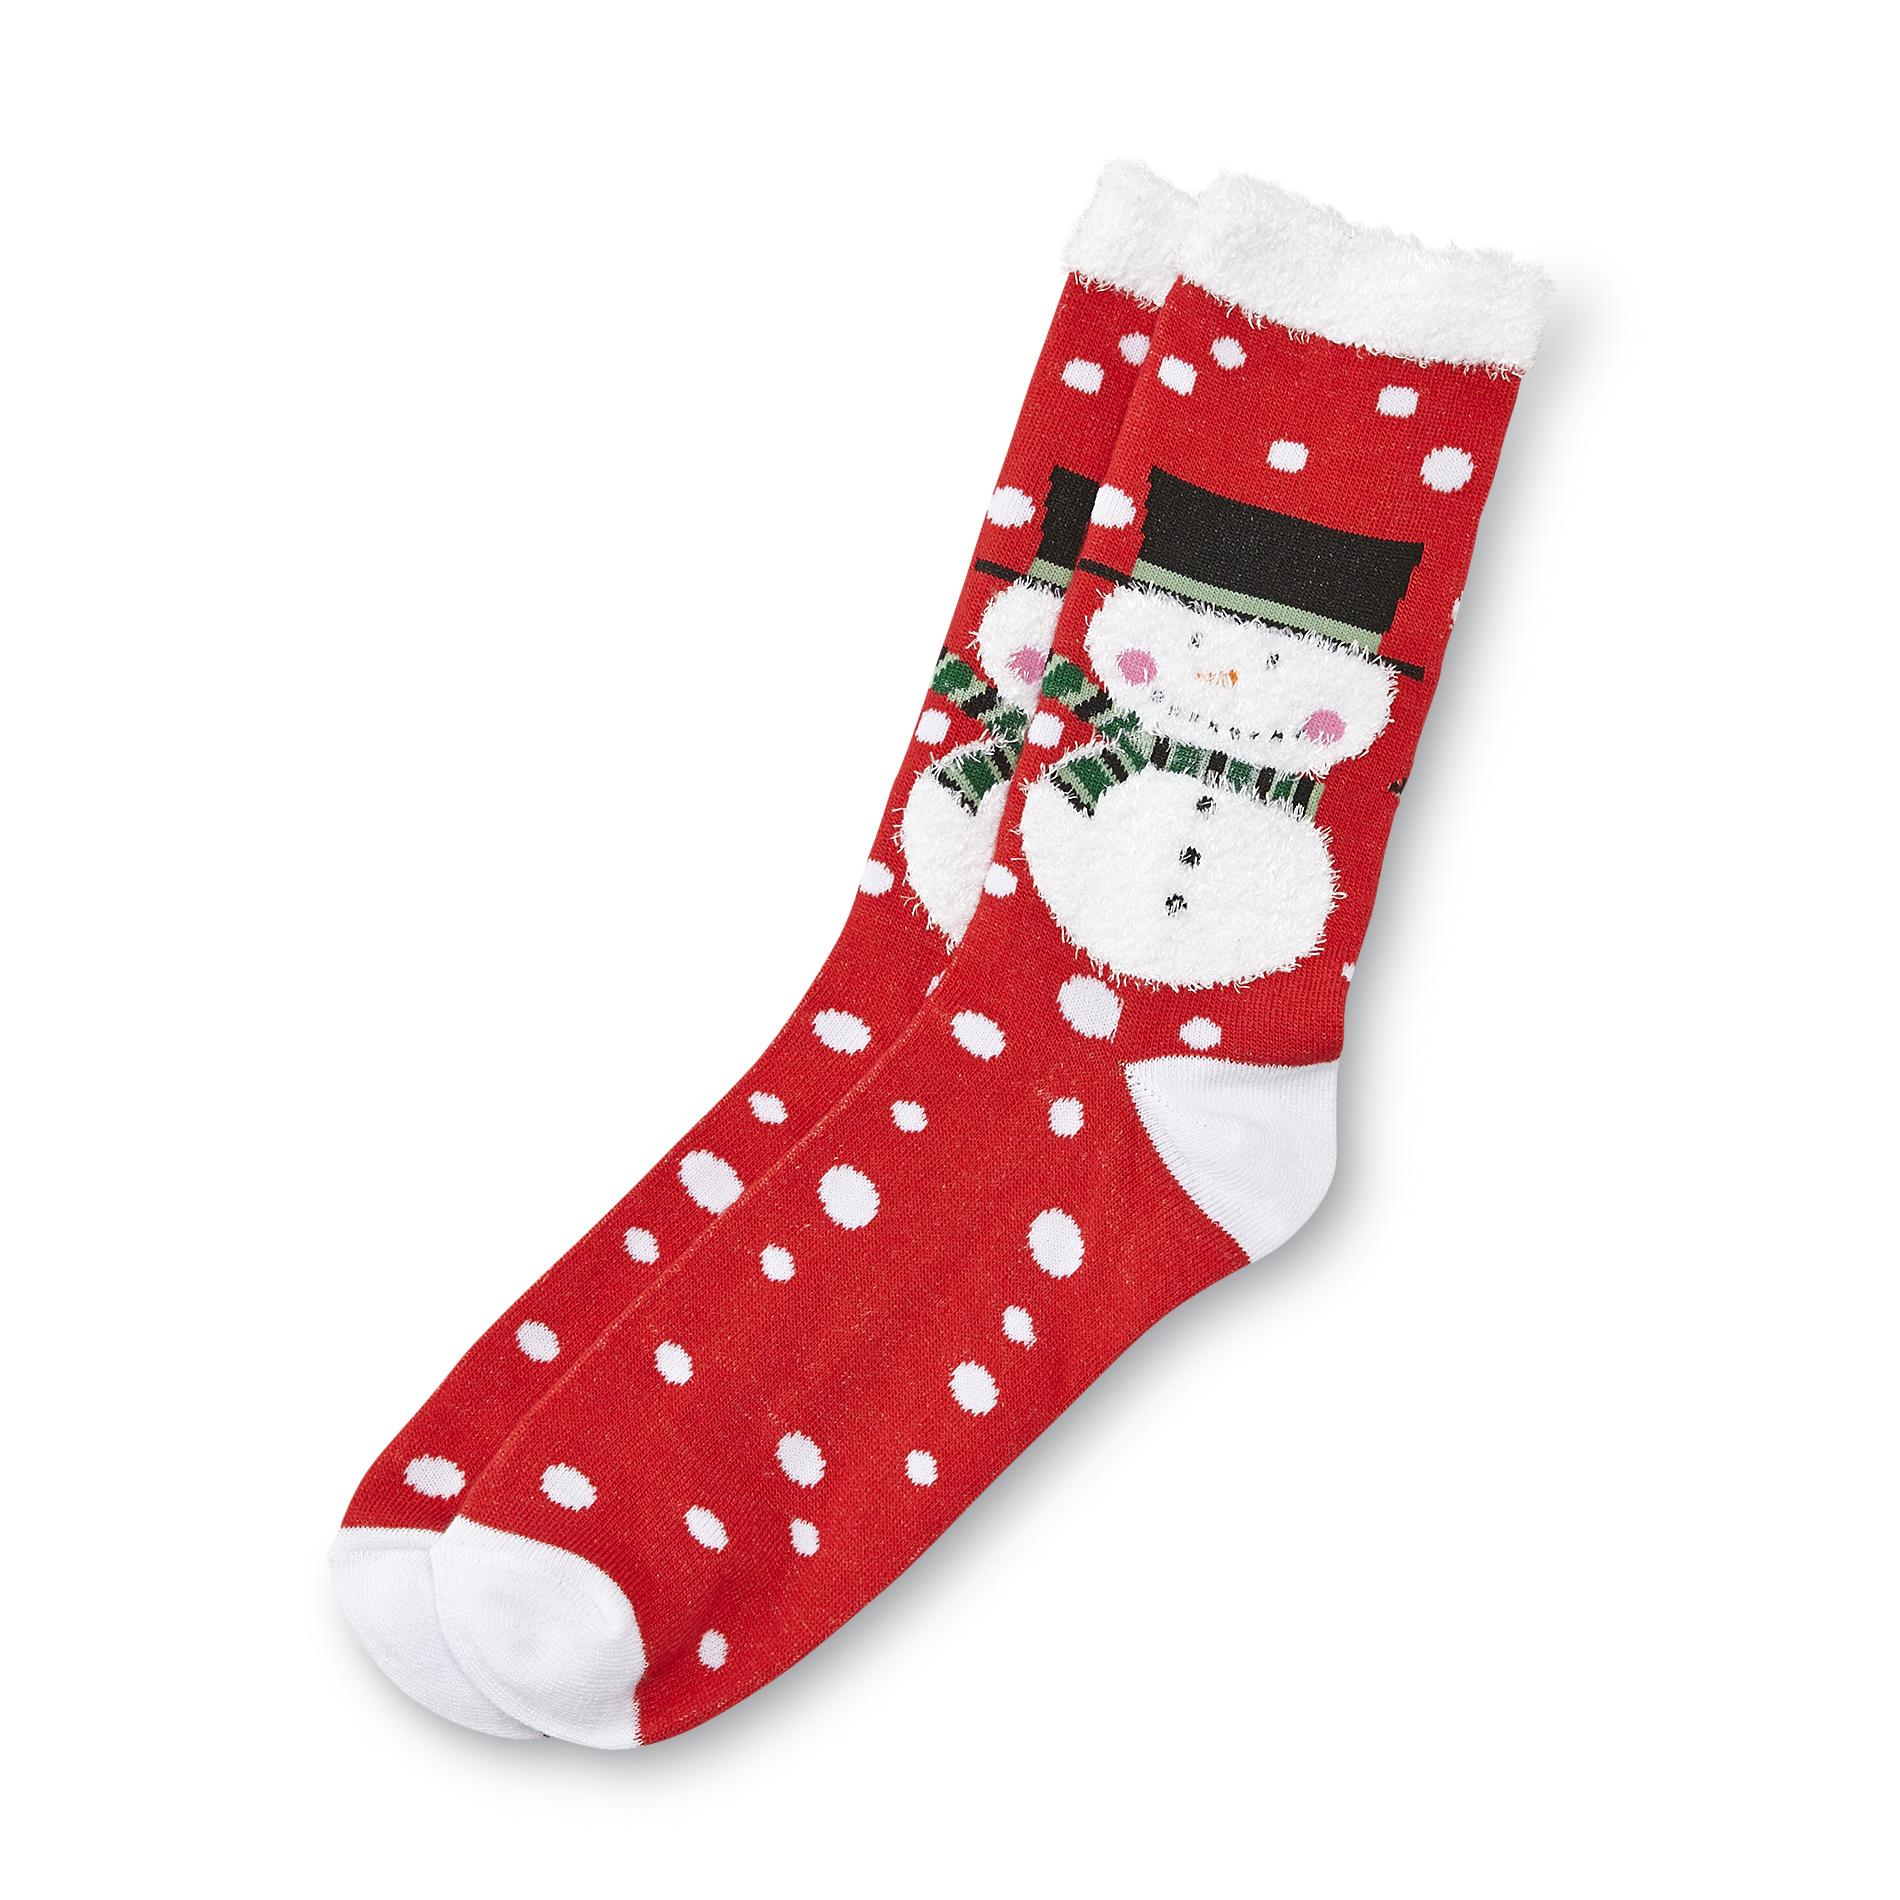 Joe Boxer Women's Christmas Crew Socks - Snowman